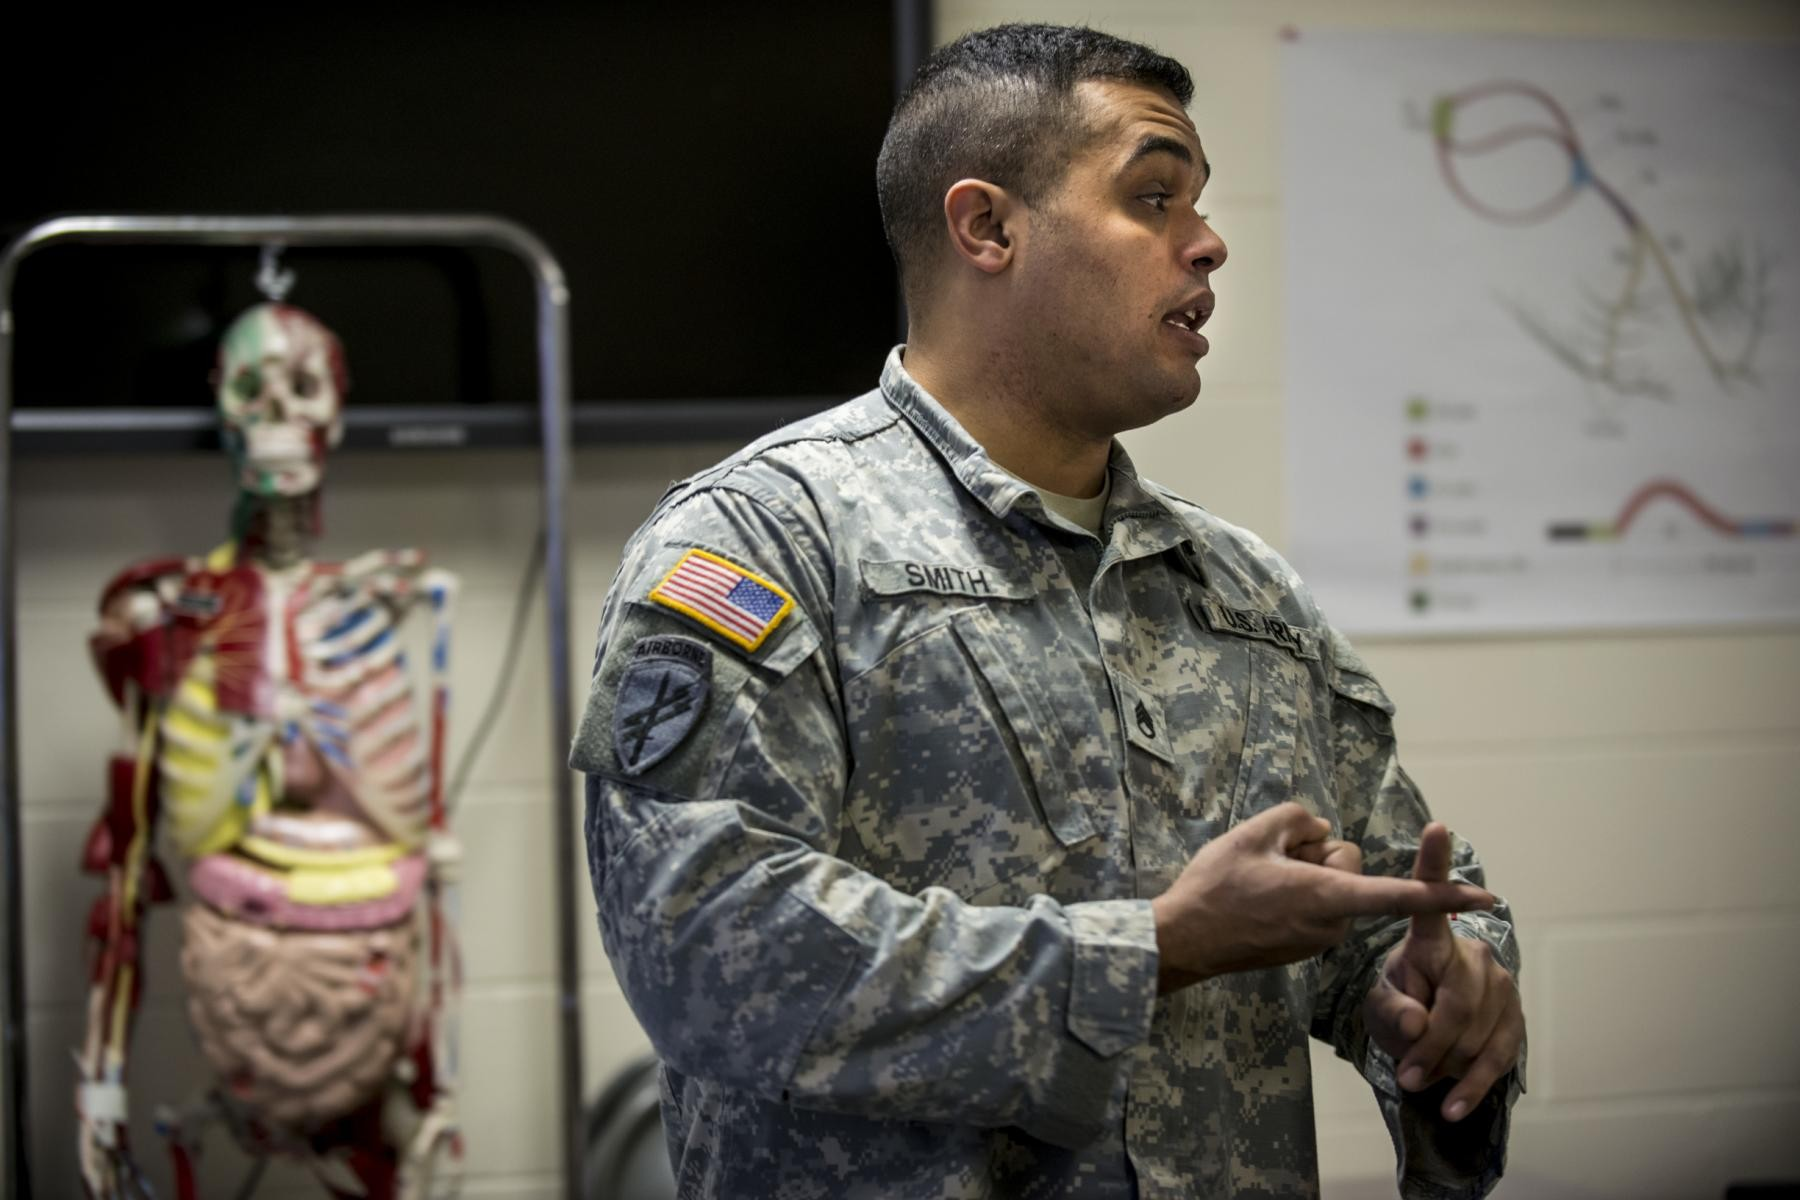 Trauma junkies: Army medics going beyond the battlefield | Article ...